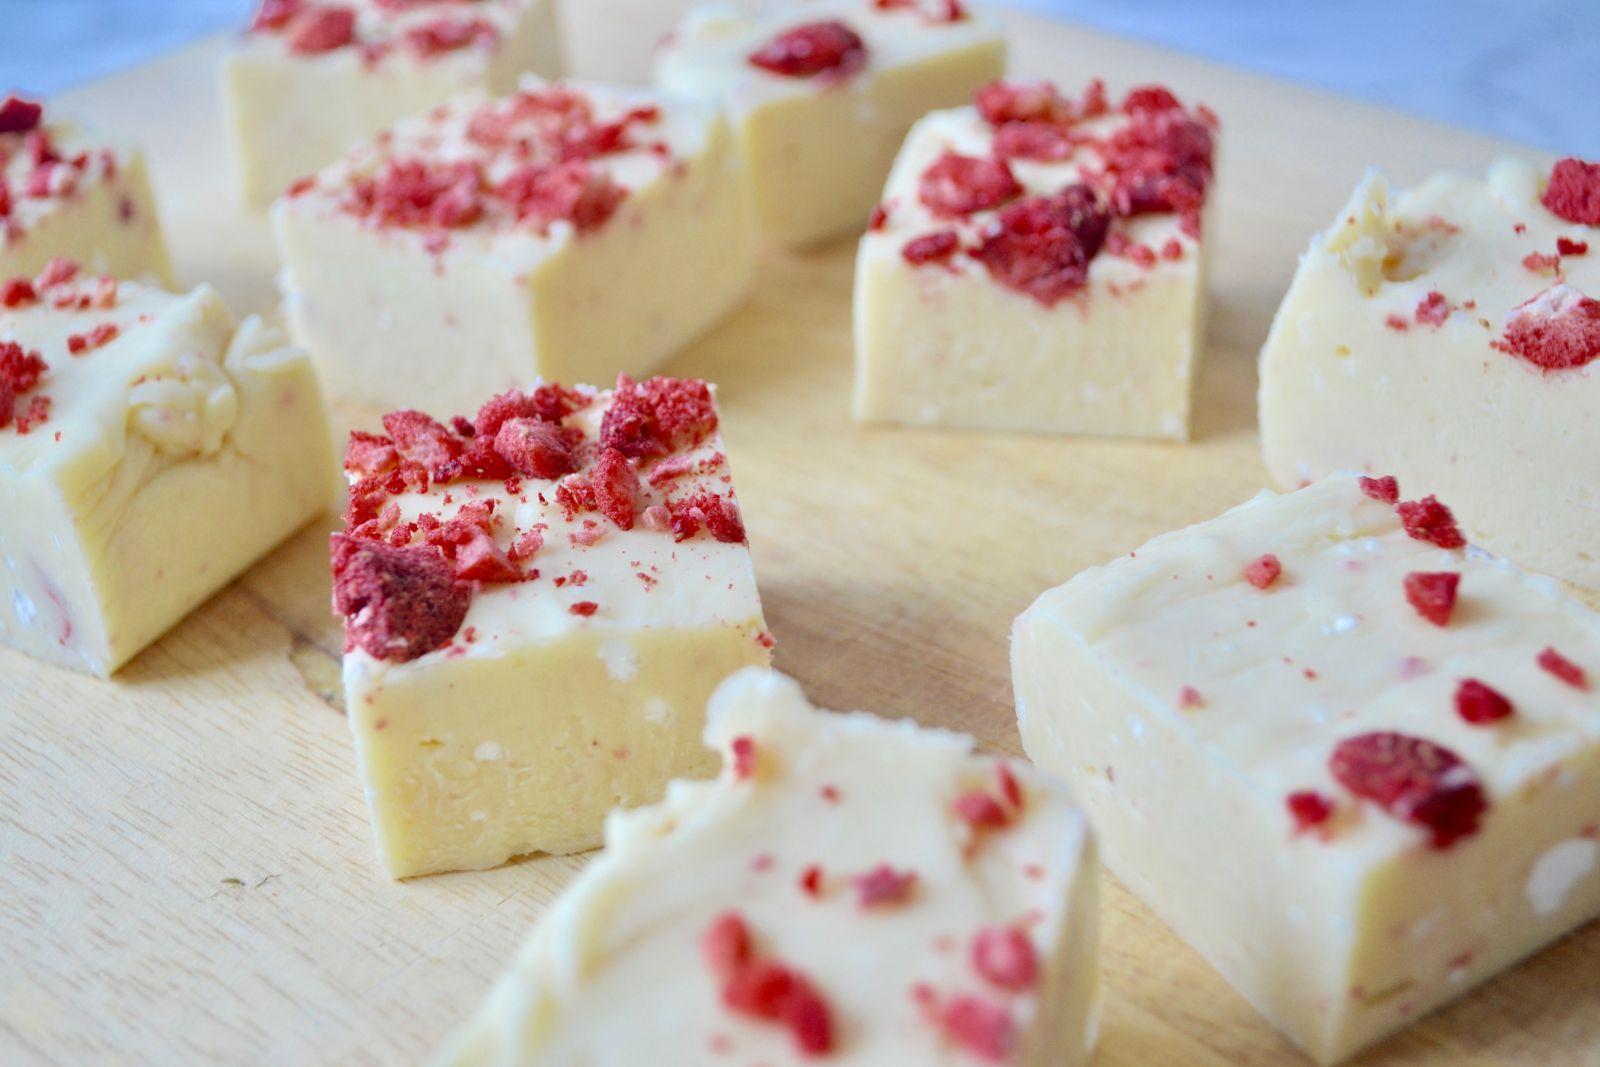 Recipe: Strawberry & White Chocolate Fudge